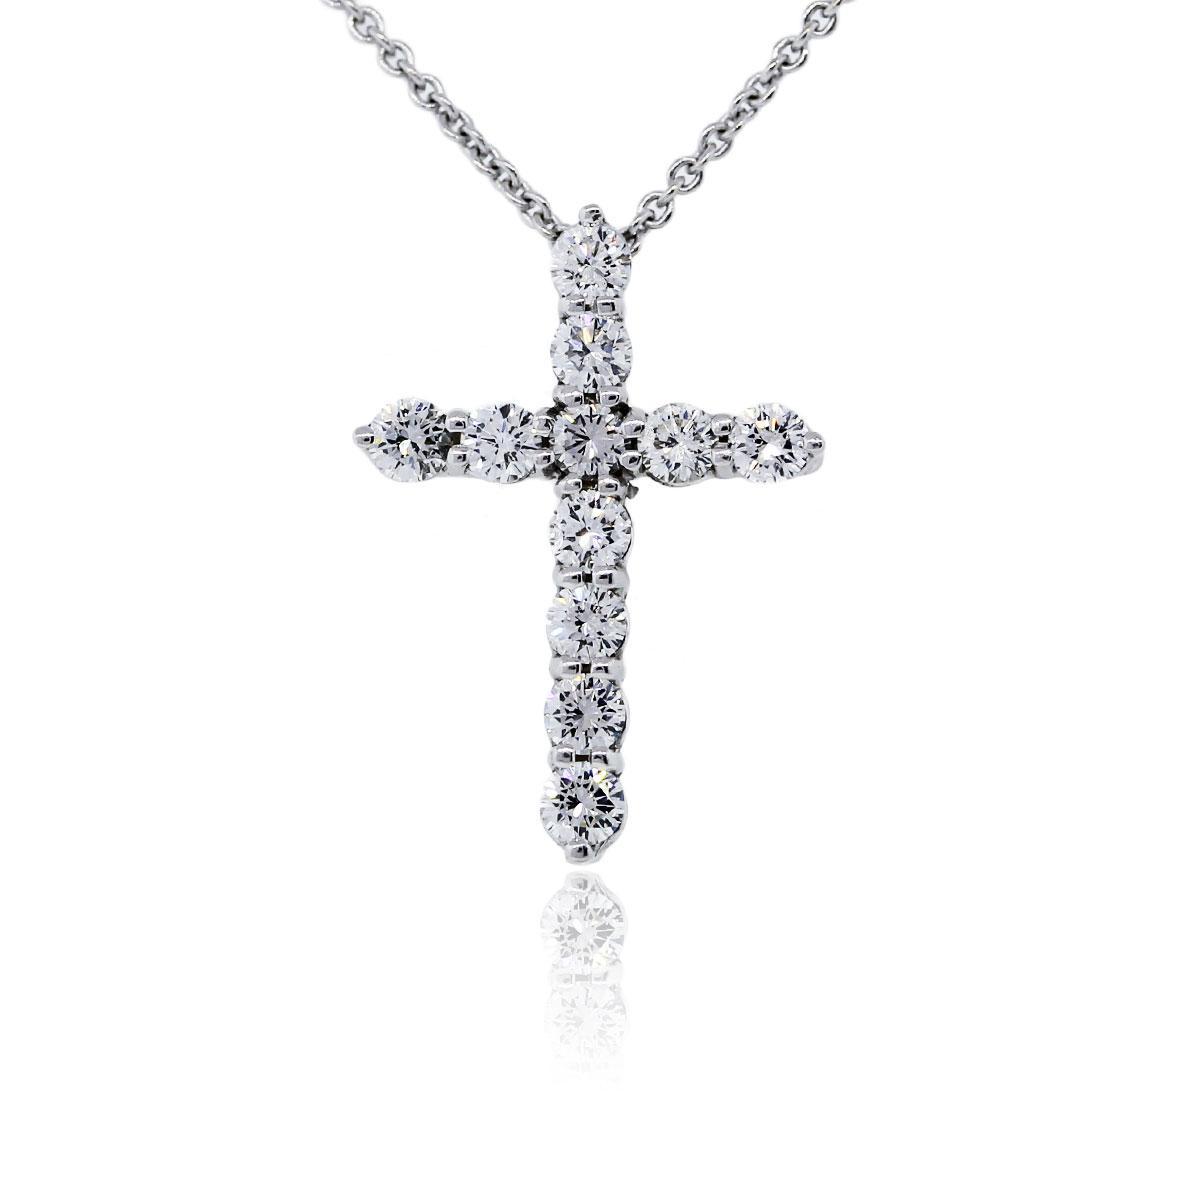 18k White Gold Diamond Cross Pendant Chain Necklace Boca